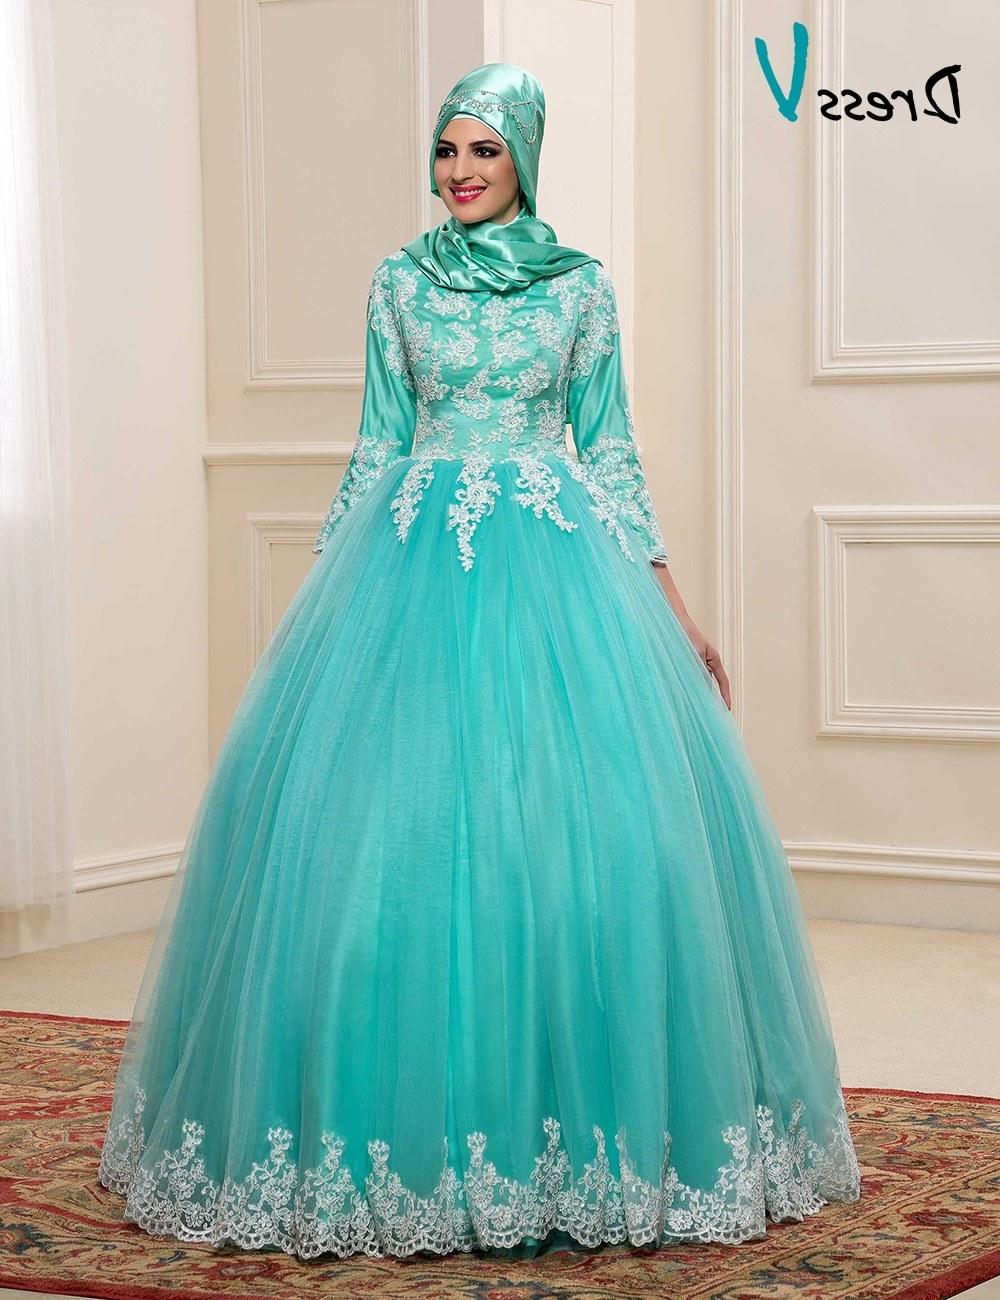 Ide Baju Pengantin Muslim Modern 2016 0gdr islamic Hijab Wedding Dresses – Fashion Dresses